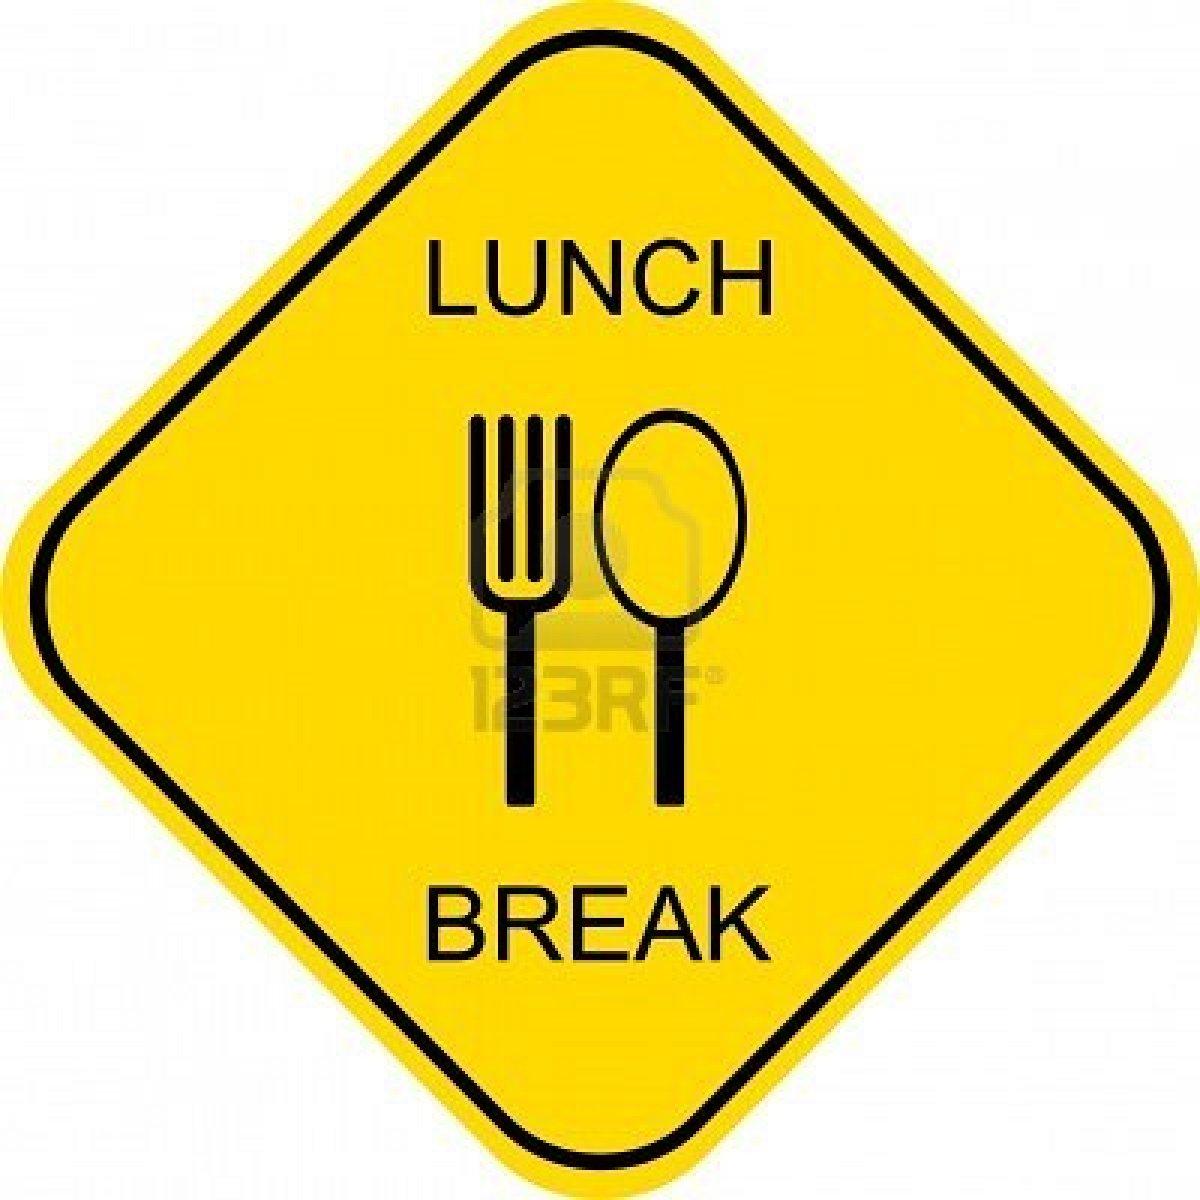 lunch break images clipart panda free clipart images out to lunch clip art free images out to lunch clip art image